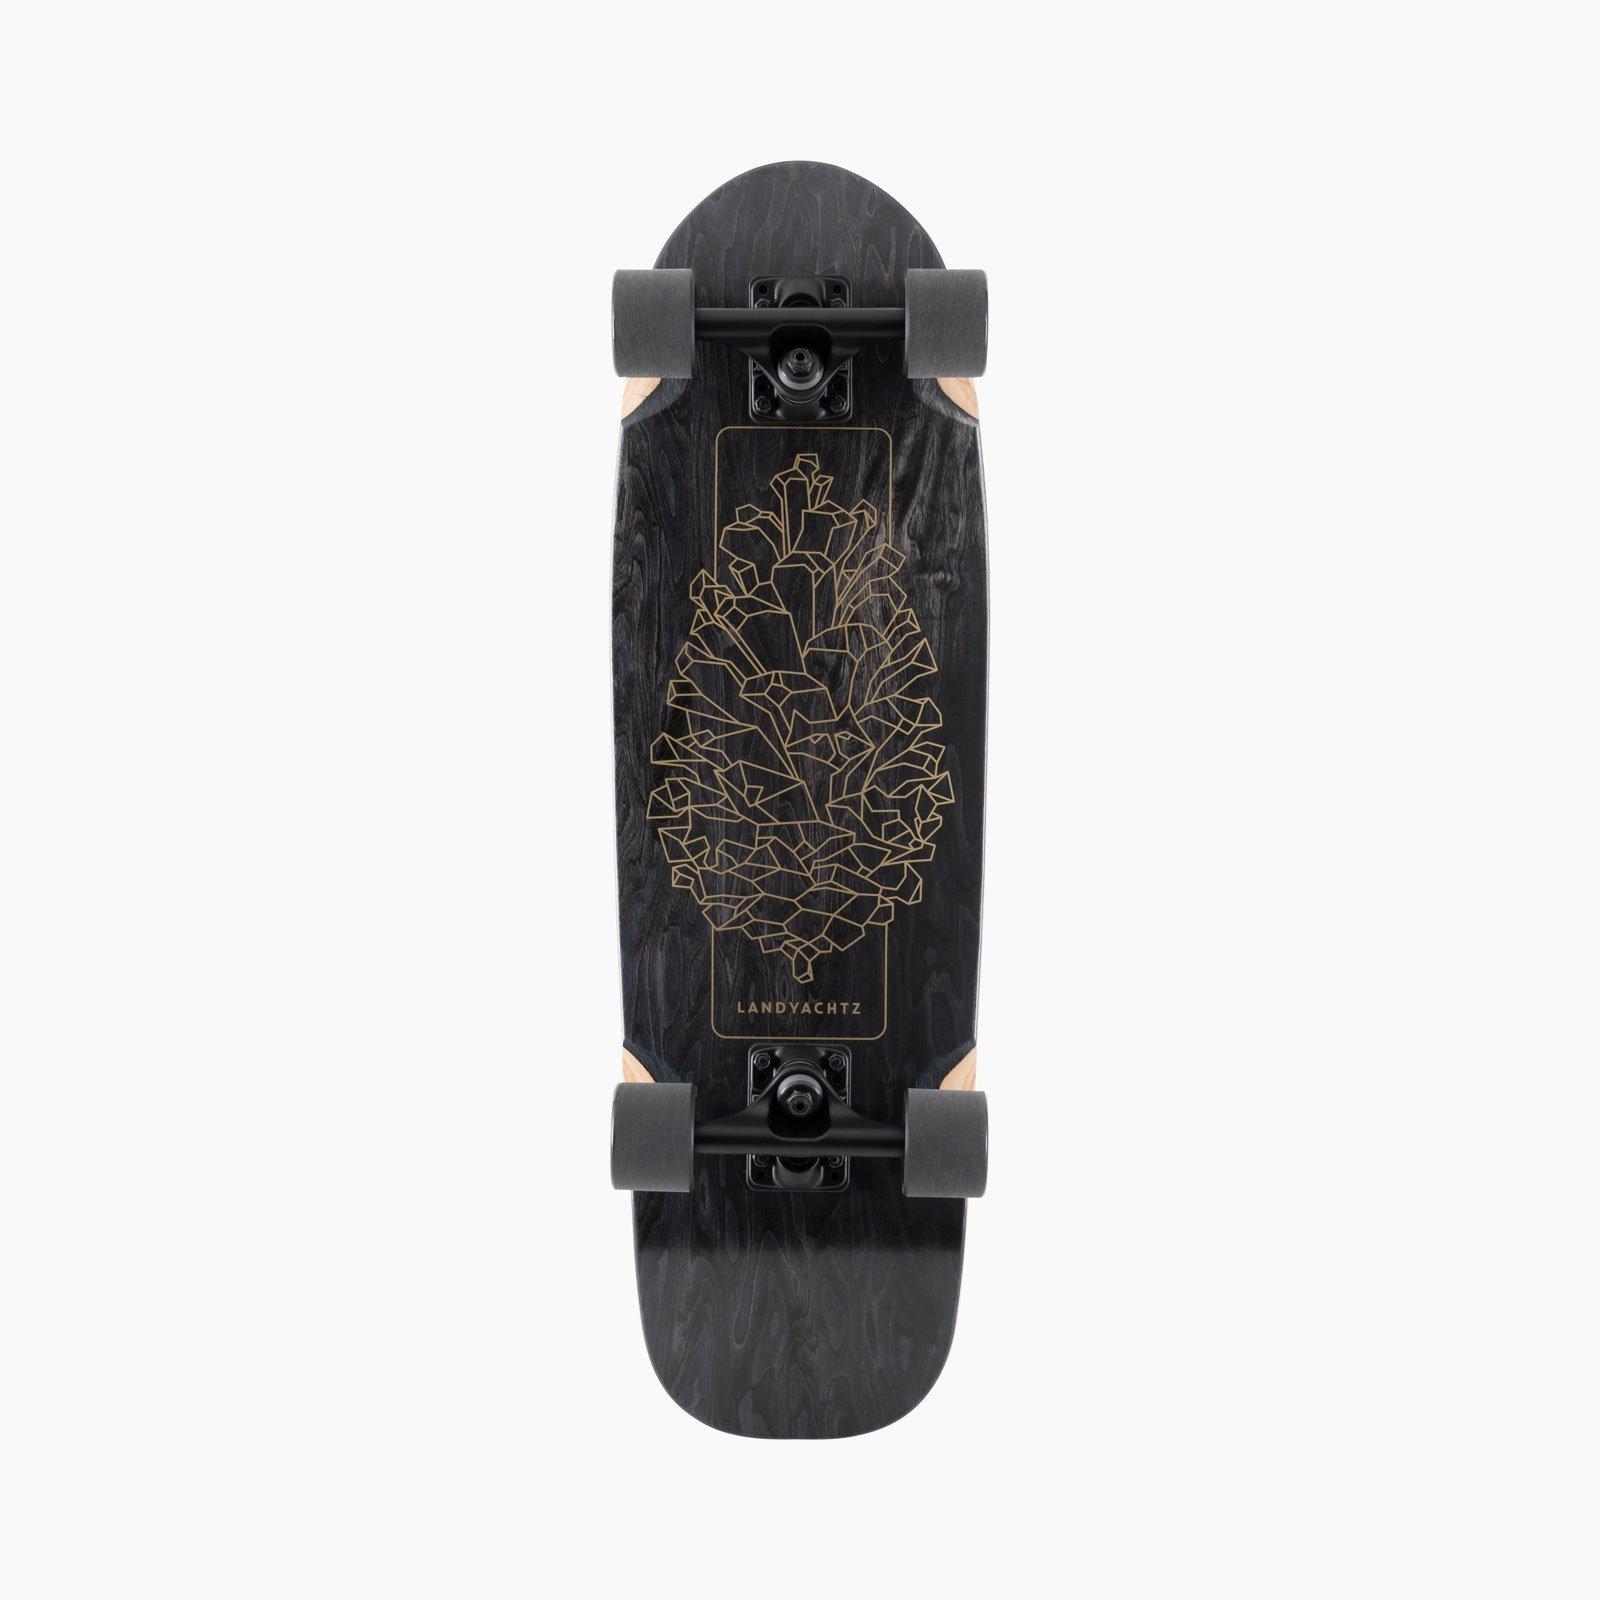 Landyachtz Dinghy Blunt Pinecone Skateboard Complete